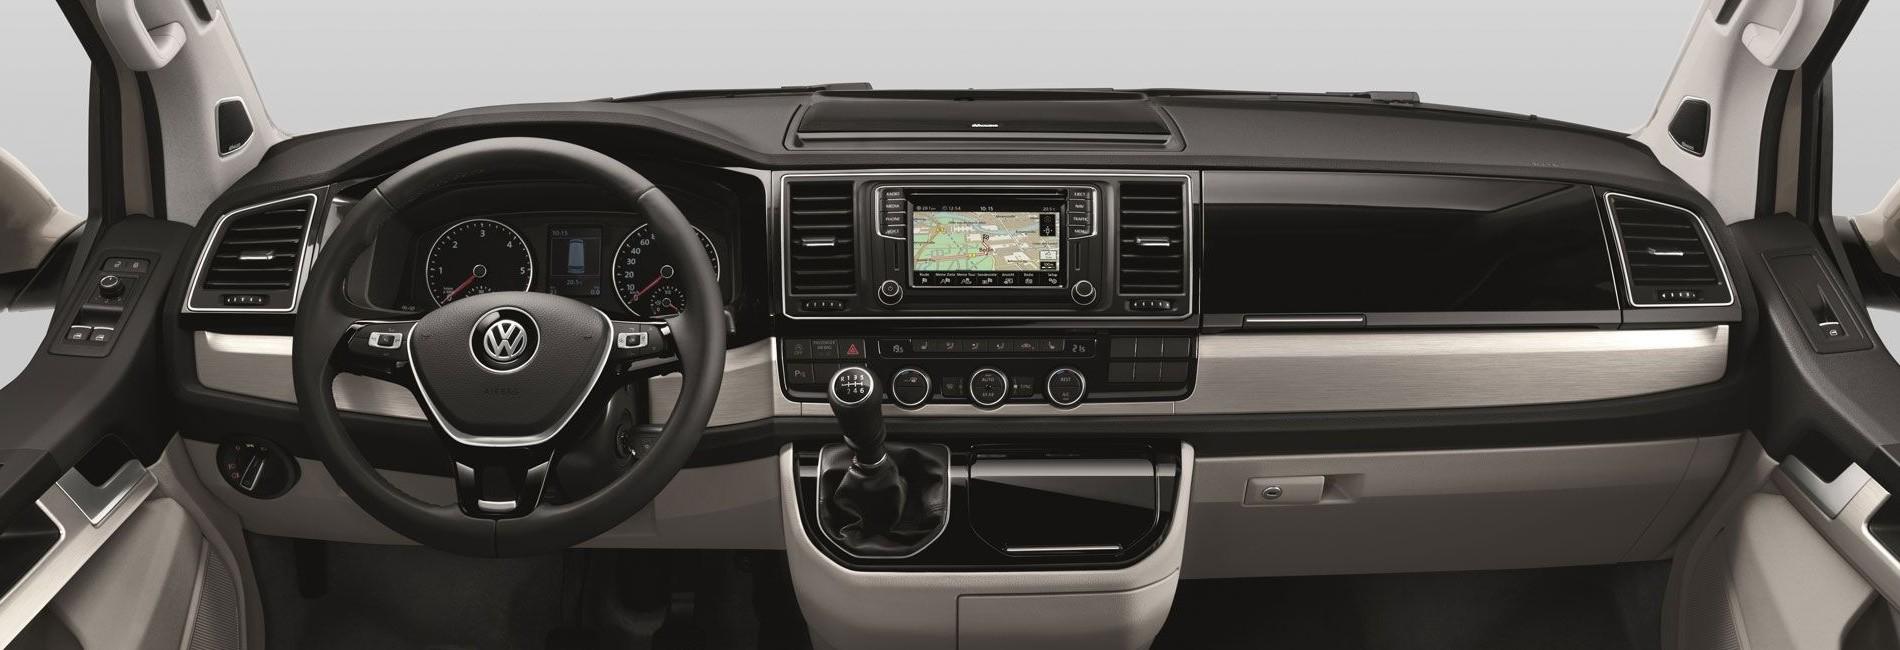 What Do the Volkswagen Jetta Warning Lights Mean? | Stohlman Volkswagen